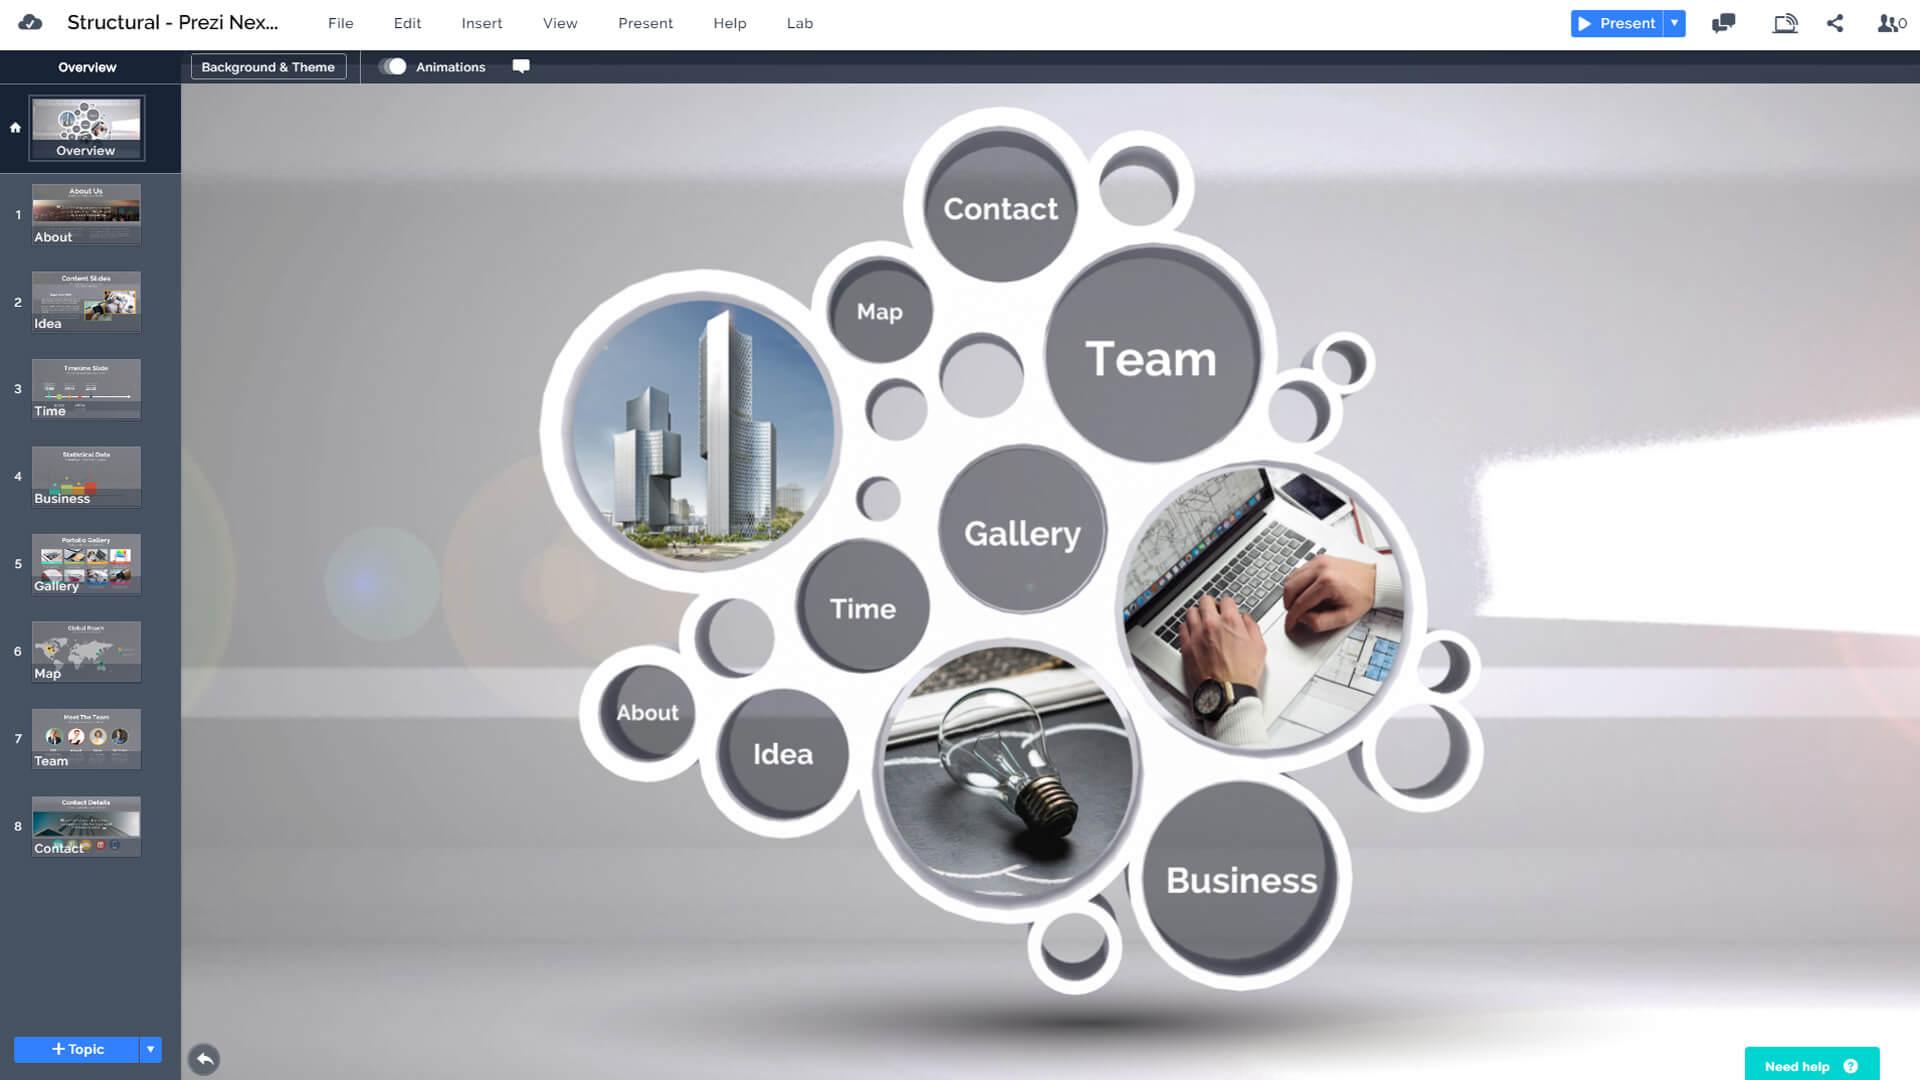 3D-circles-structure-presentation-template-design-for-prezi-next